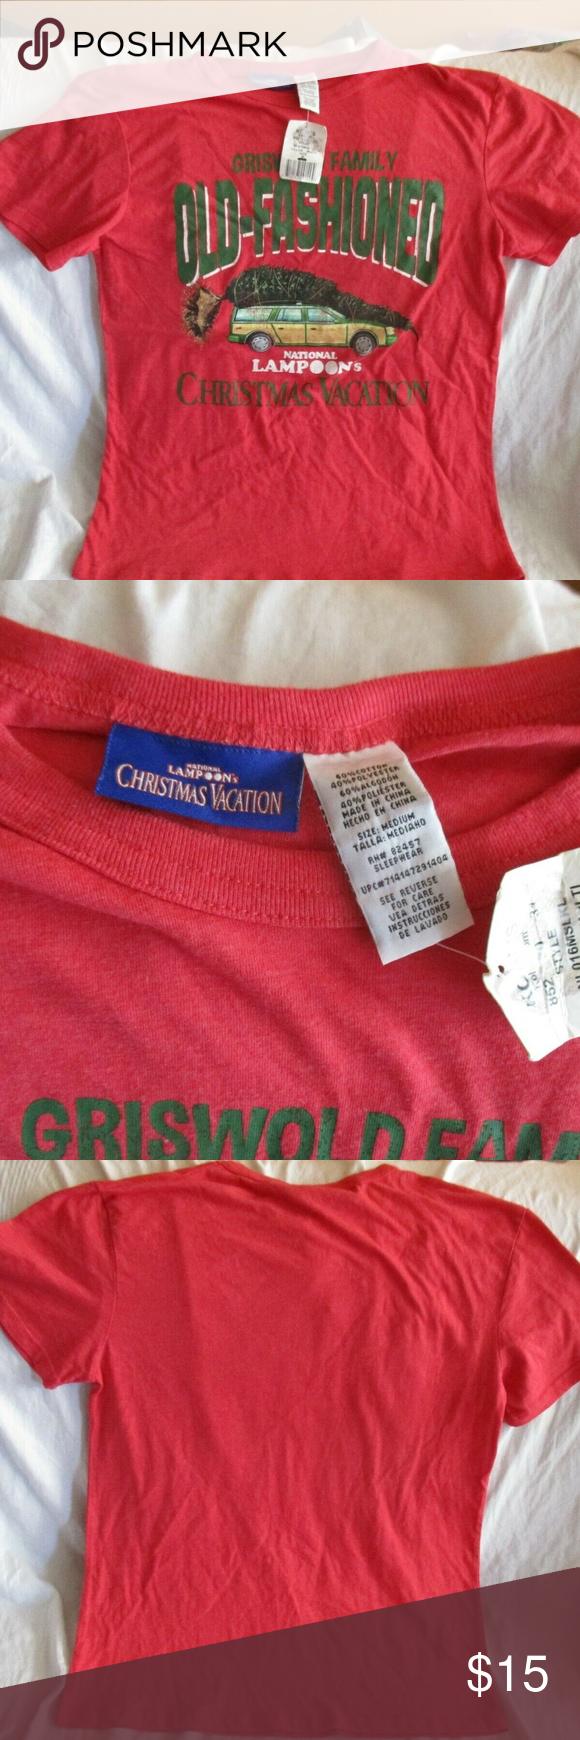 National Lampoon's Christmas Vacation T-shirt Nwt Nwt